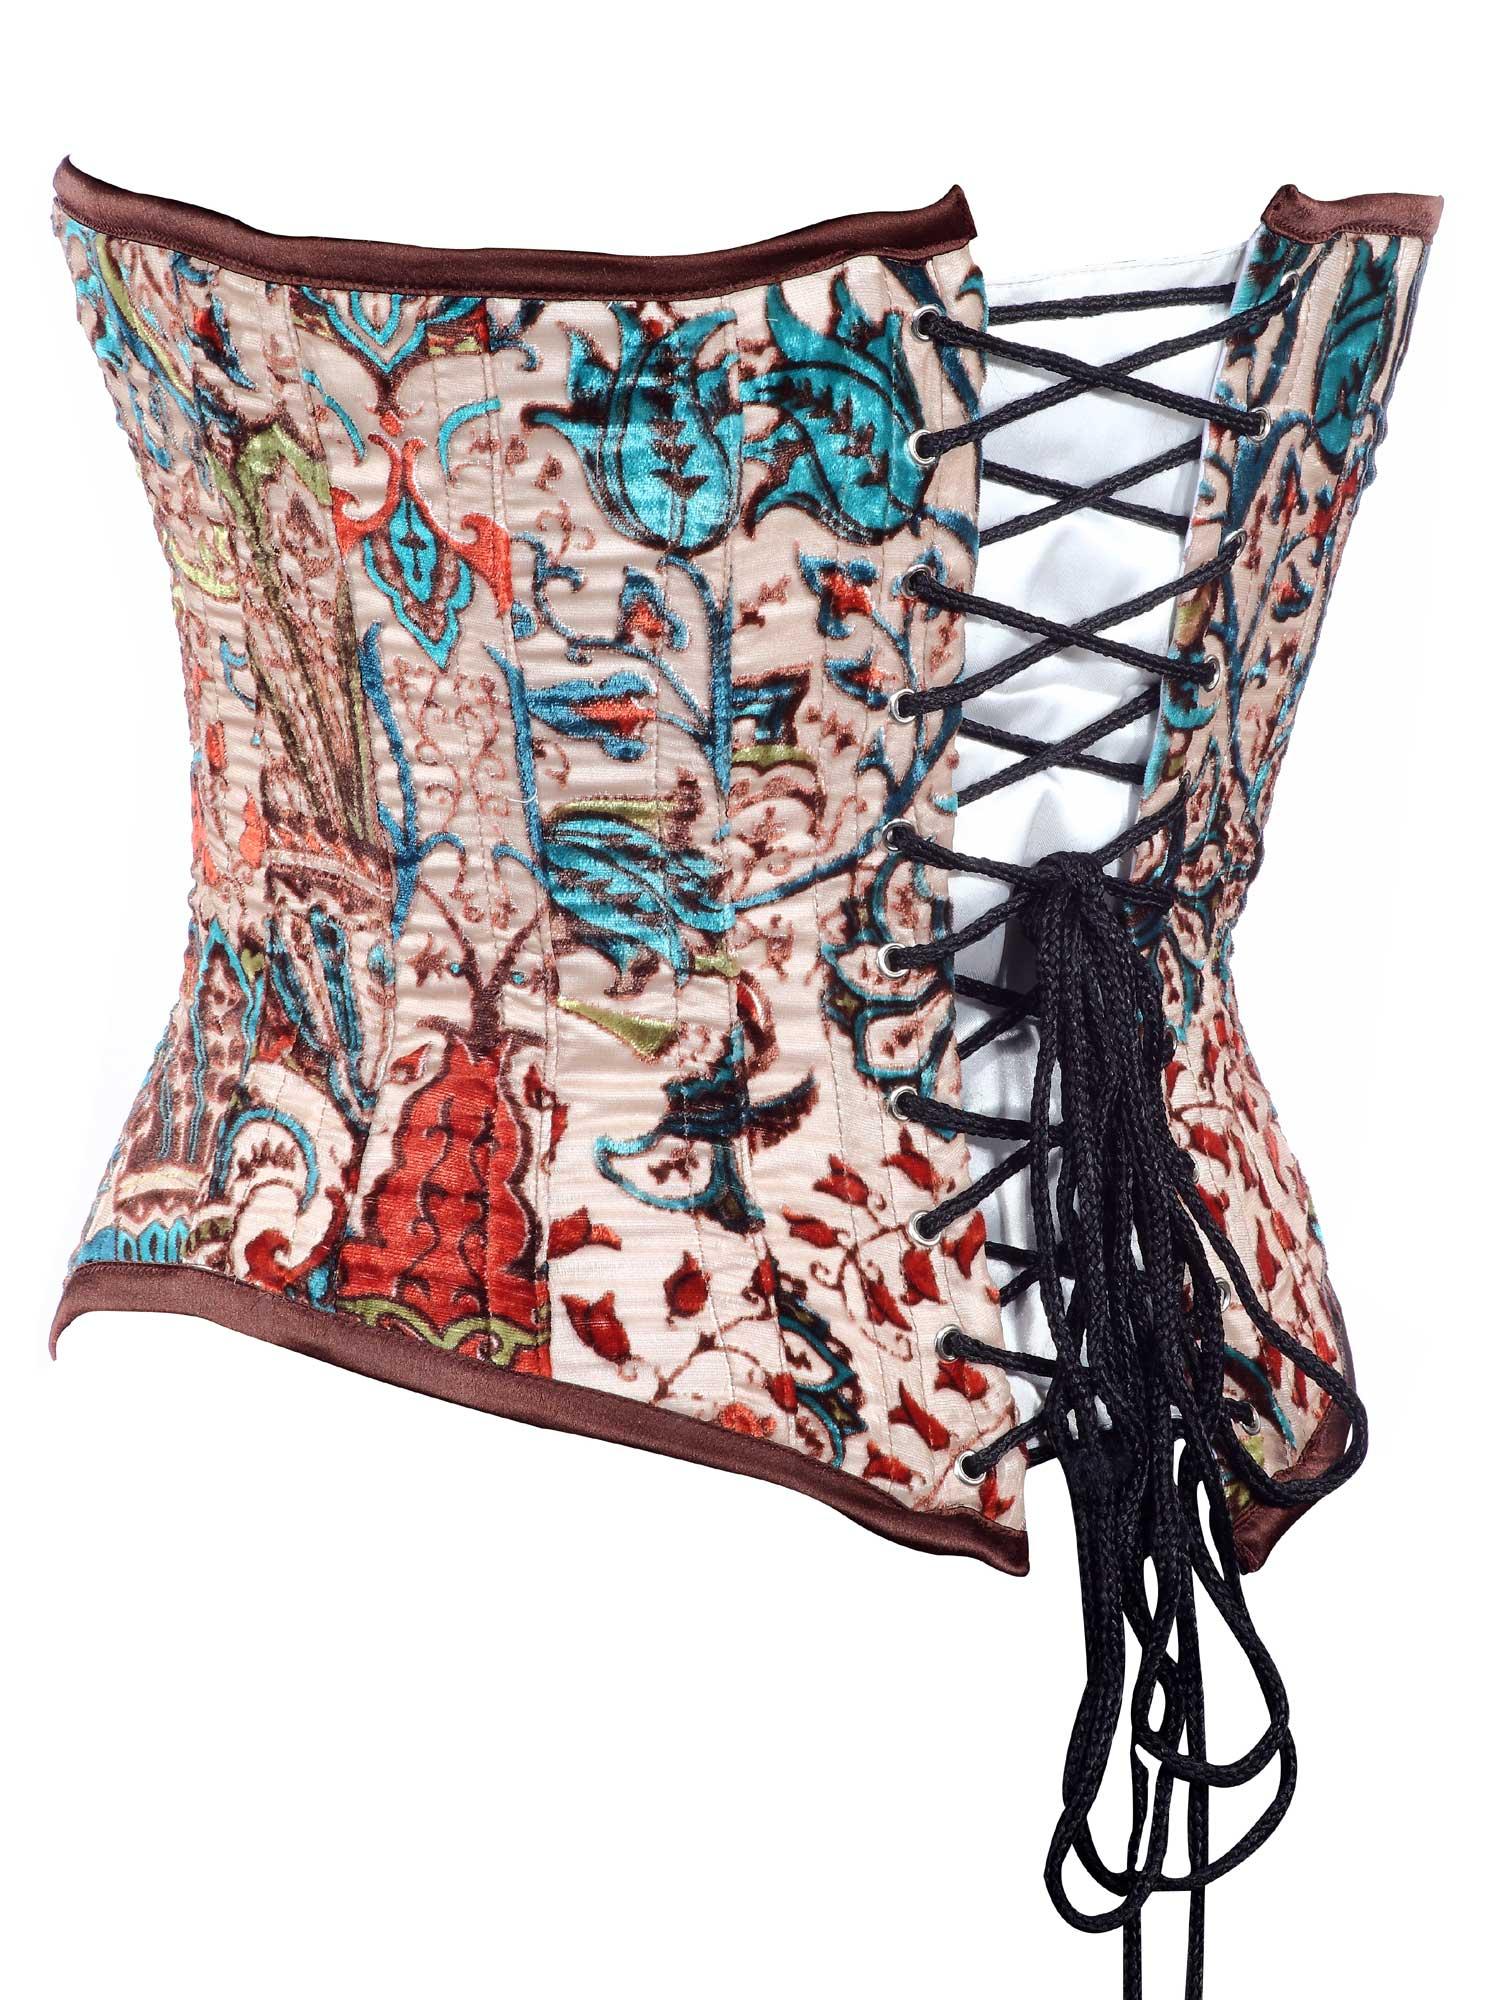 floral_velvet_fabric_steel_boning_underbust_corset_waist_cincher_bustier_bustiers_and_corsets_3.jpg